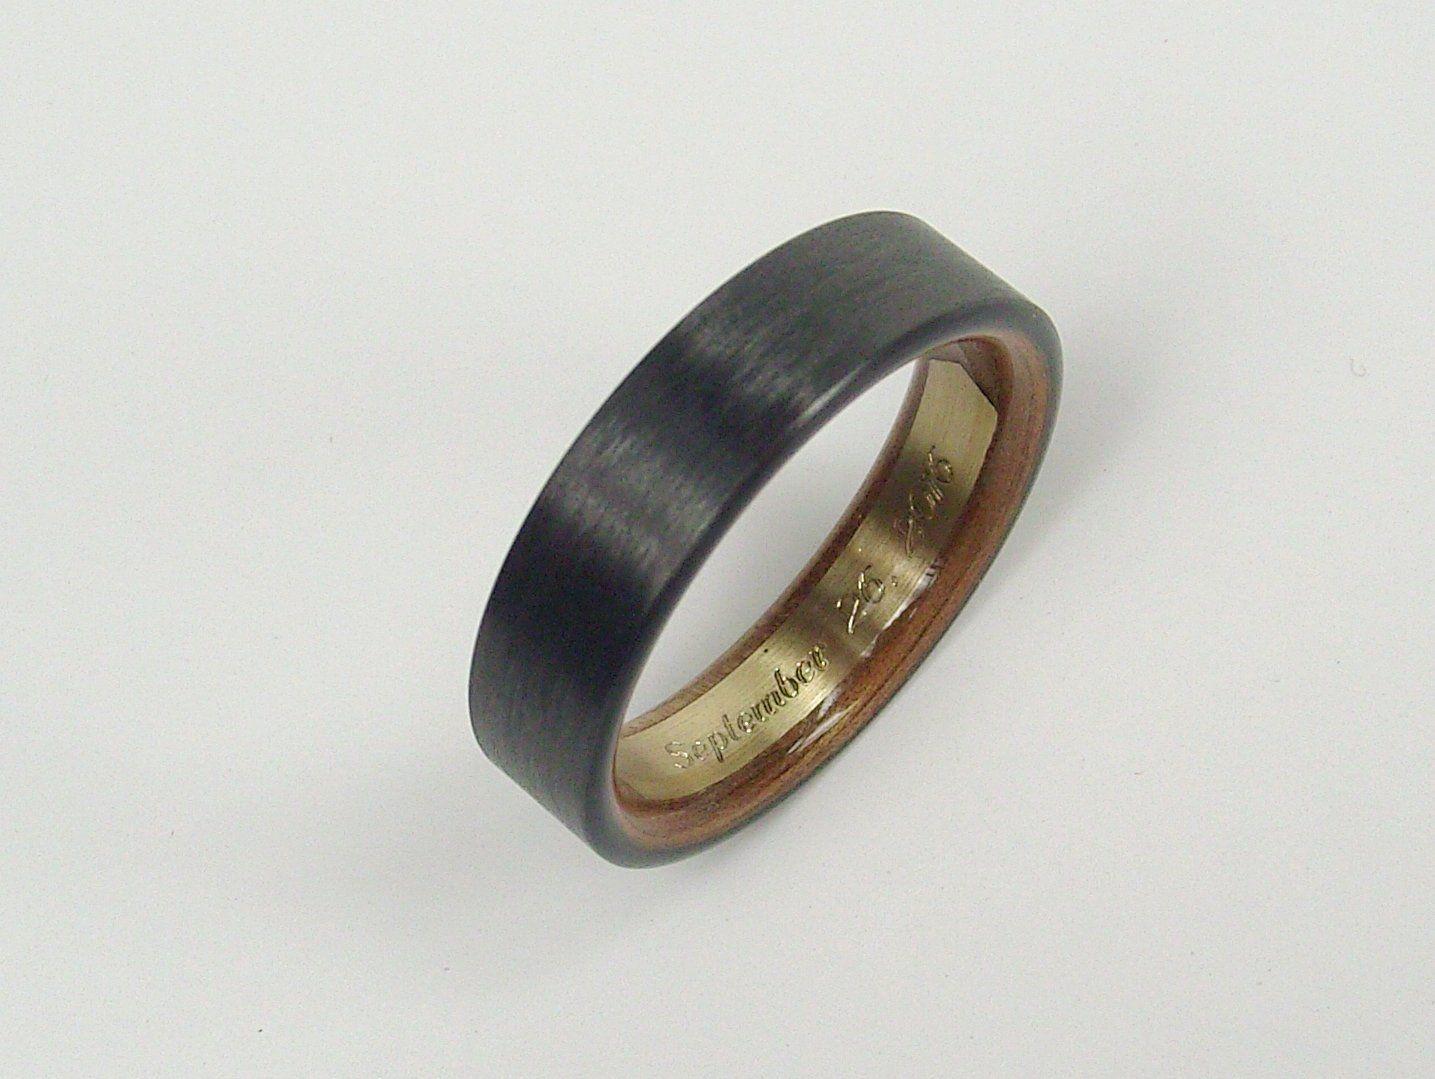 Black carbon fiber ring with a hawaiian koa wood interior featuring